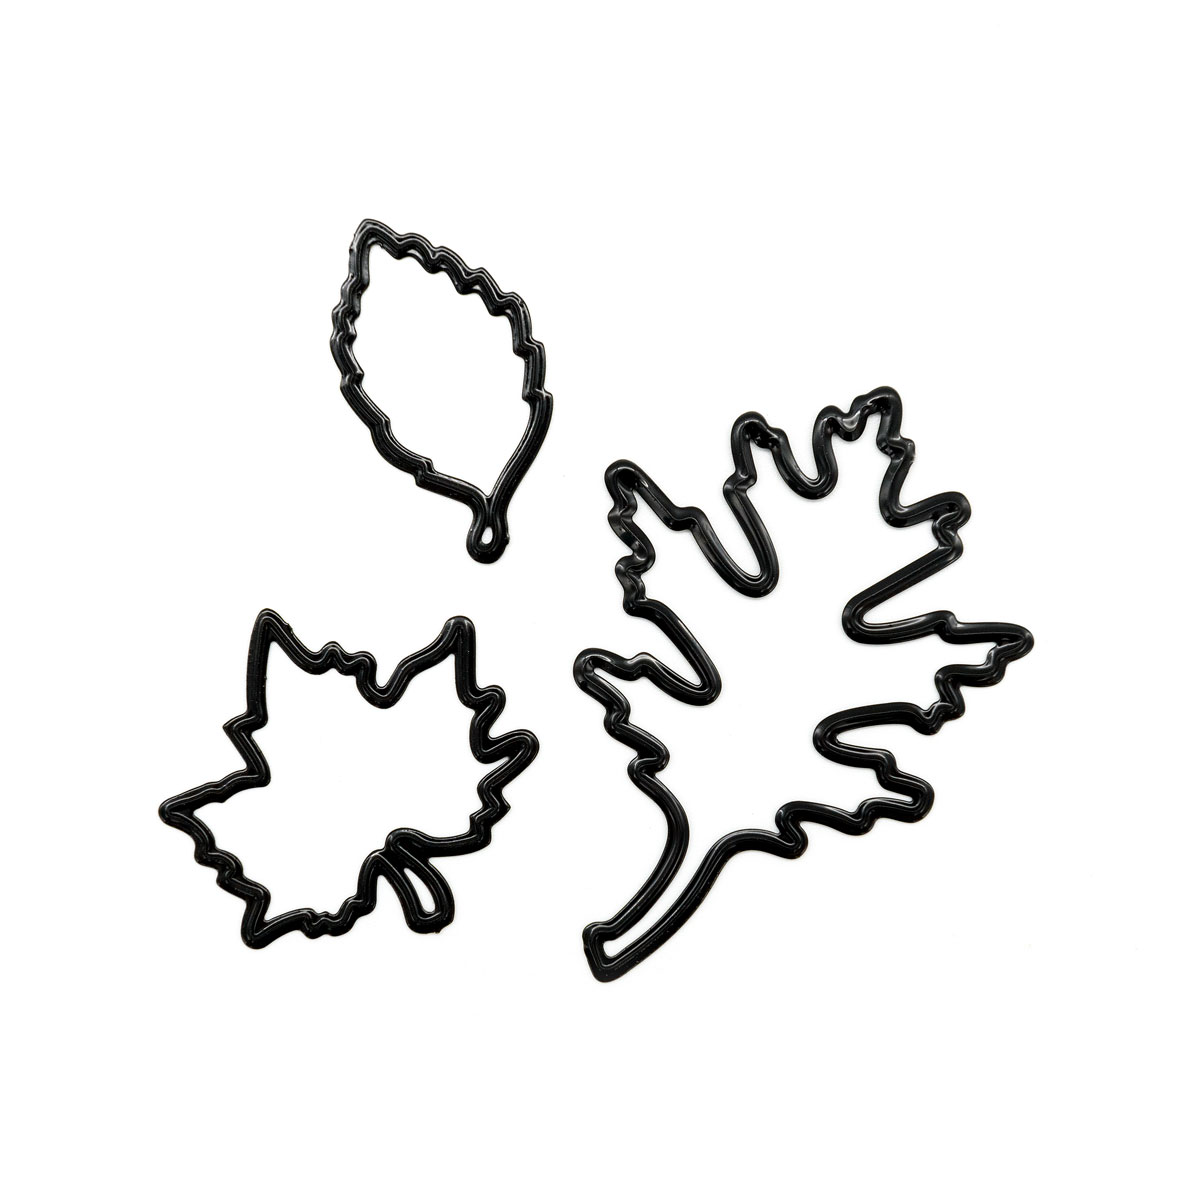 Форма для вырубки Листочки #22855 SCB 20022855